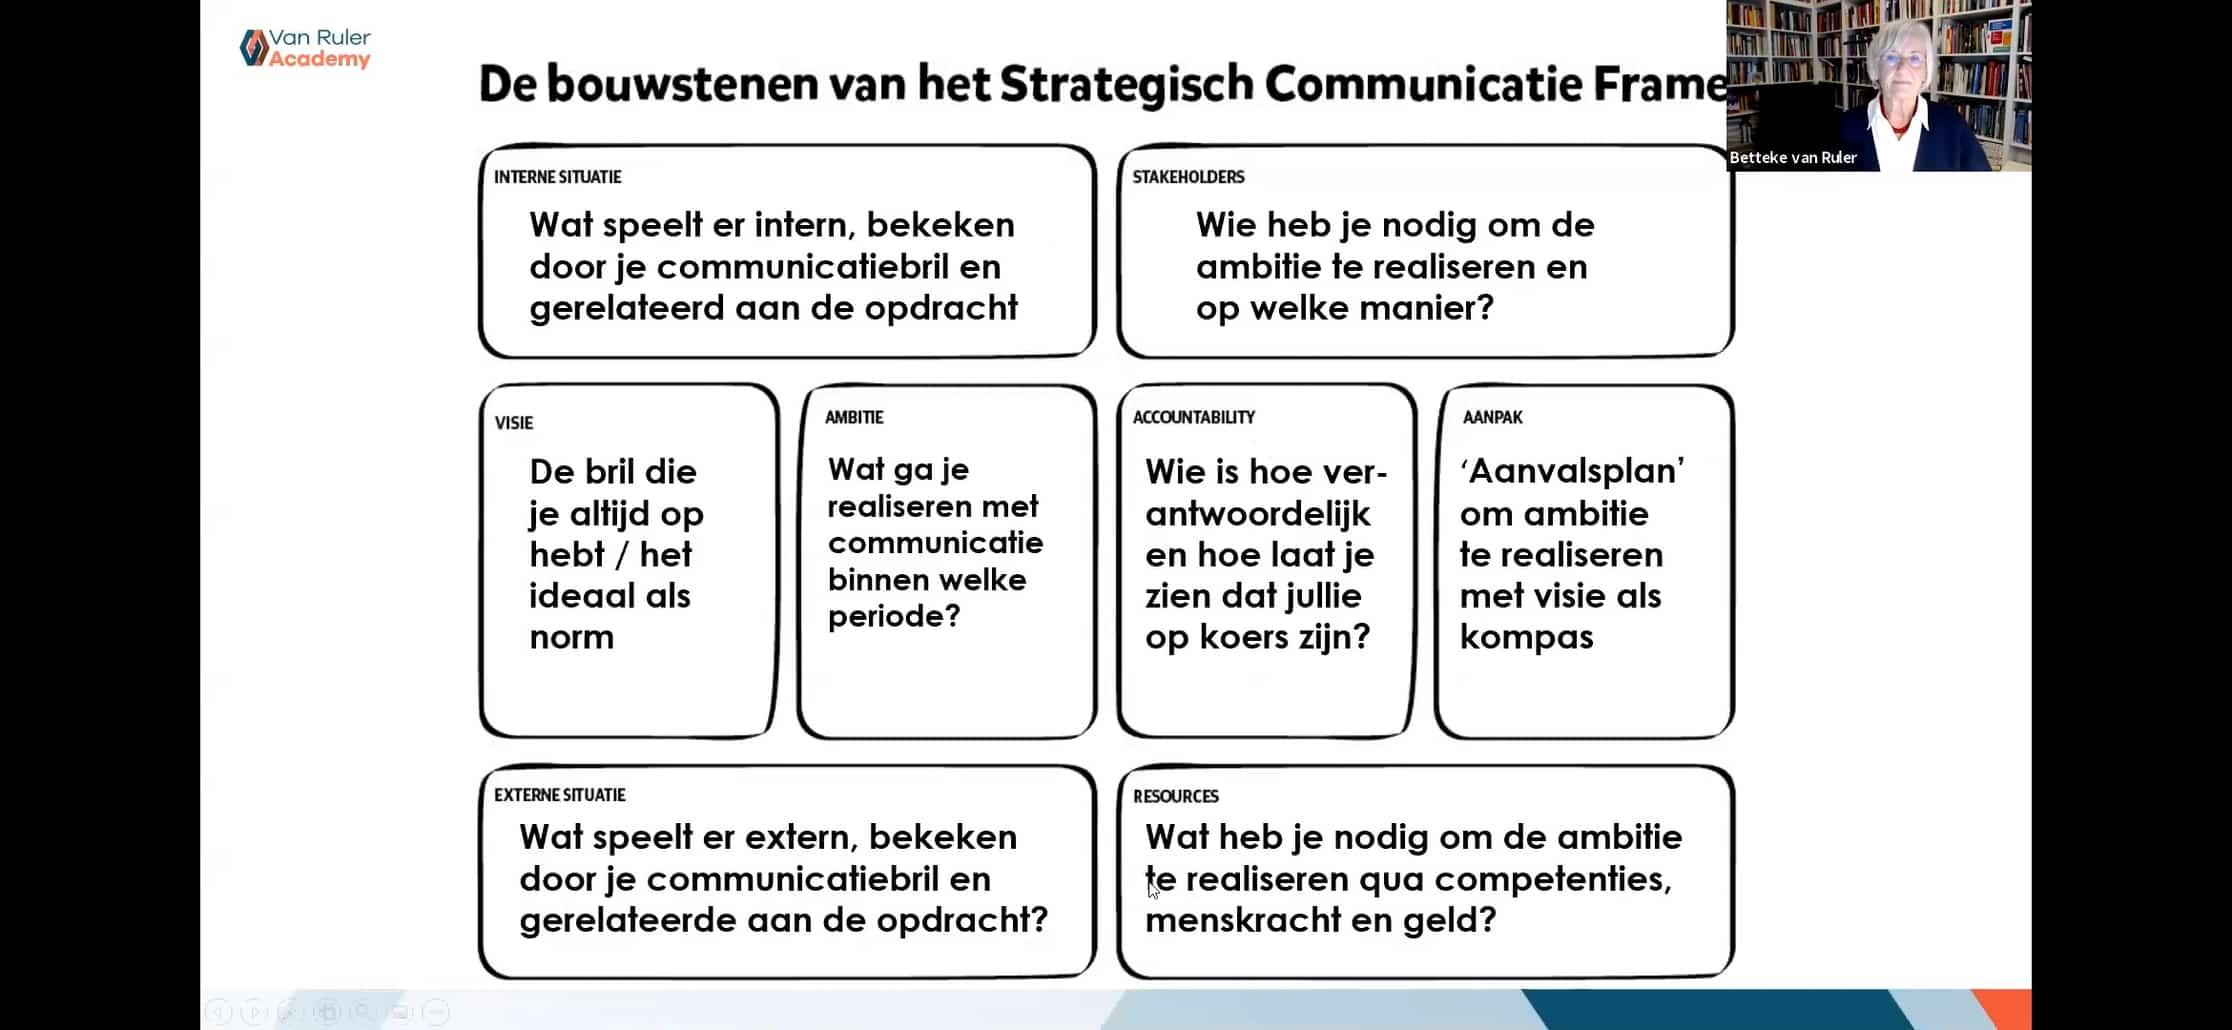 strategisch communicatie frame model Betteke van Ruler